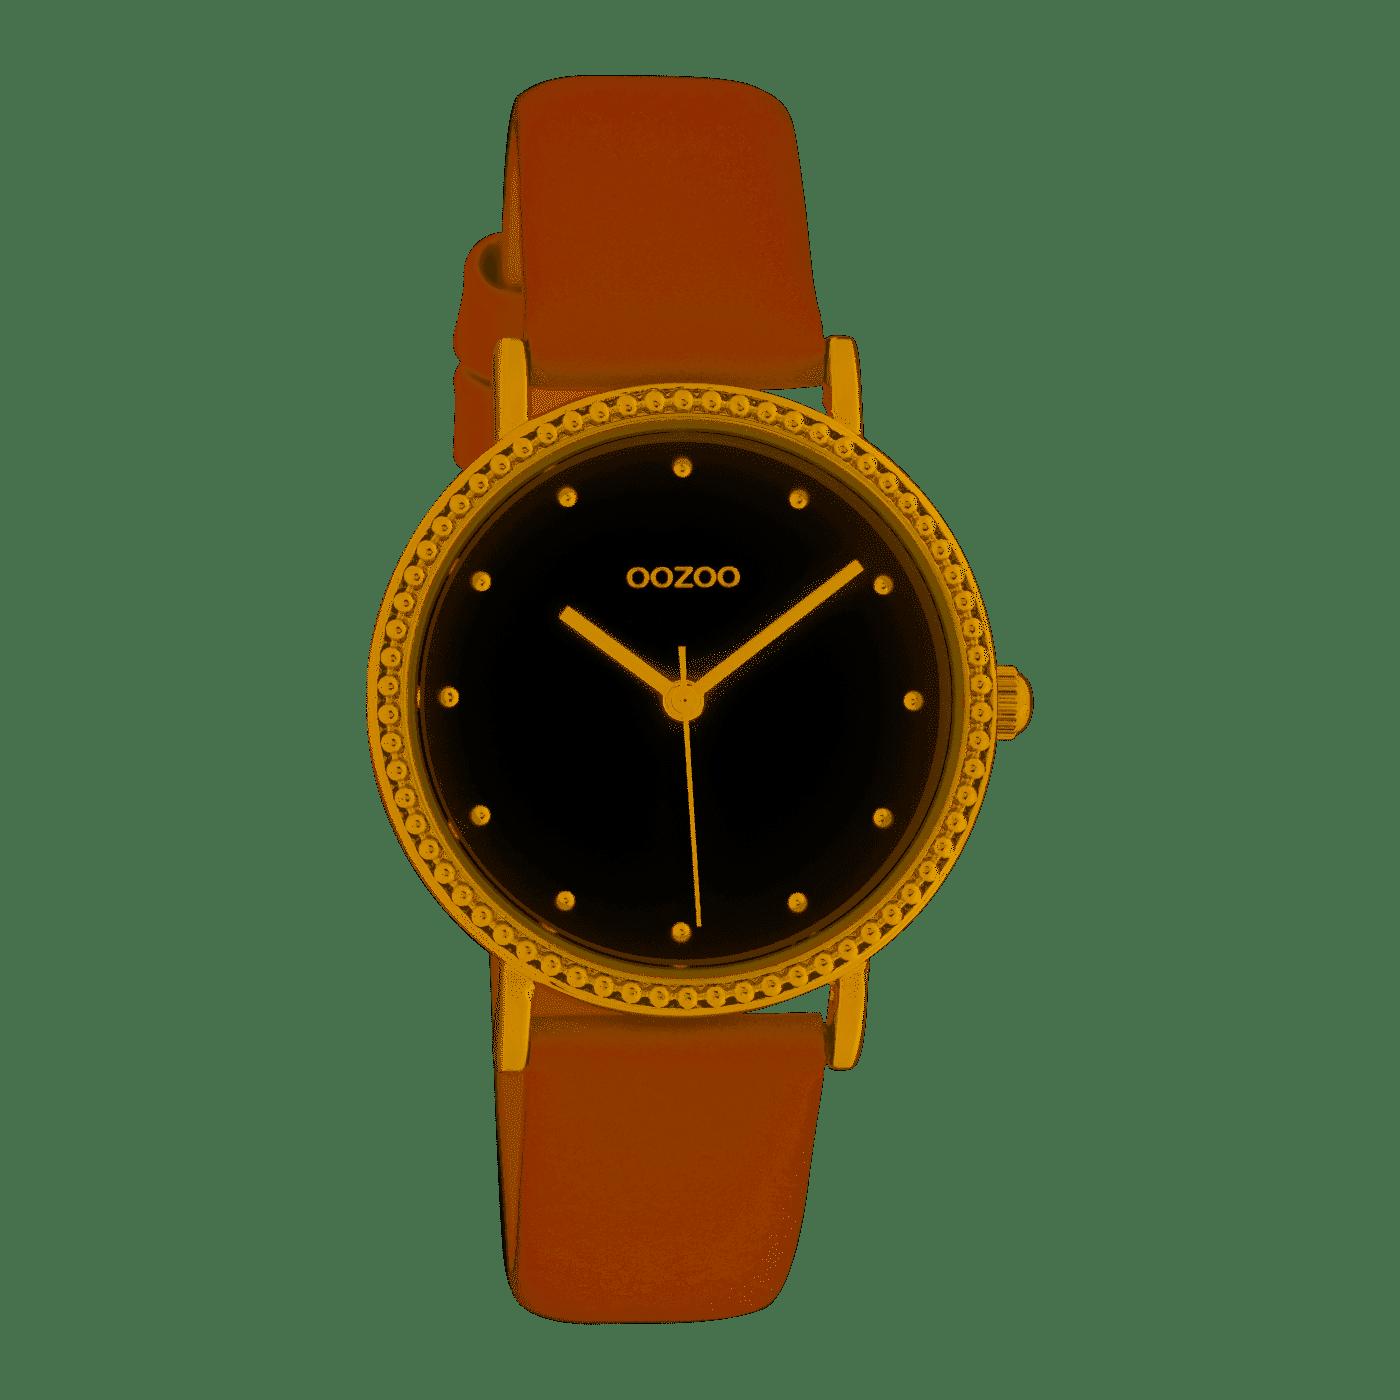 Damenarmbanduhr in zartrosa Leder und vergoldetem Gehäuse C10421